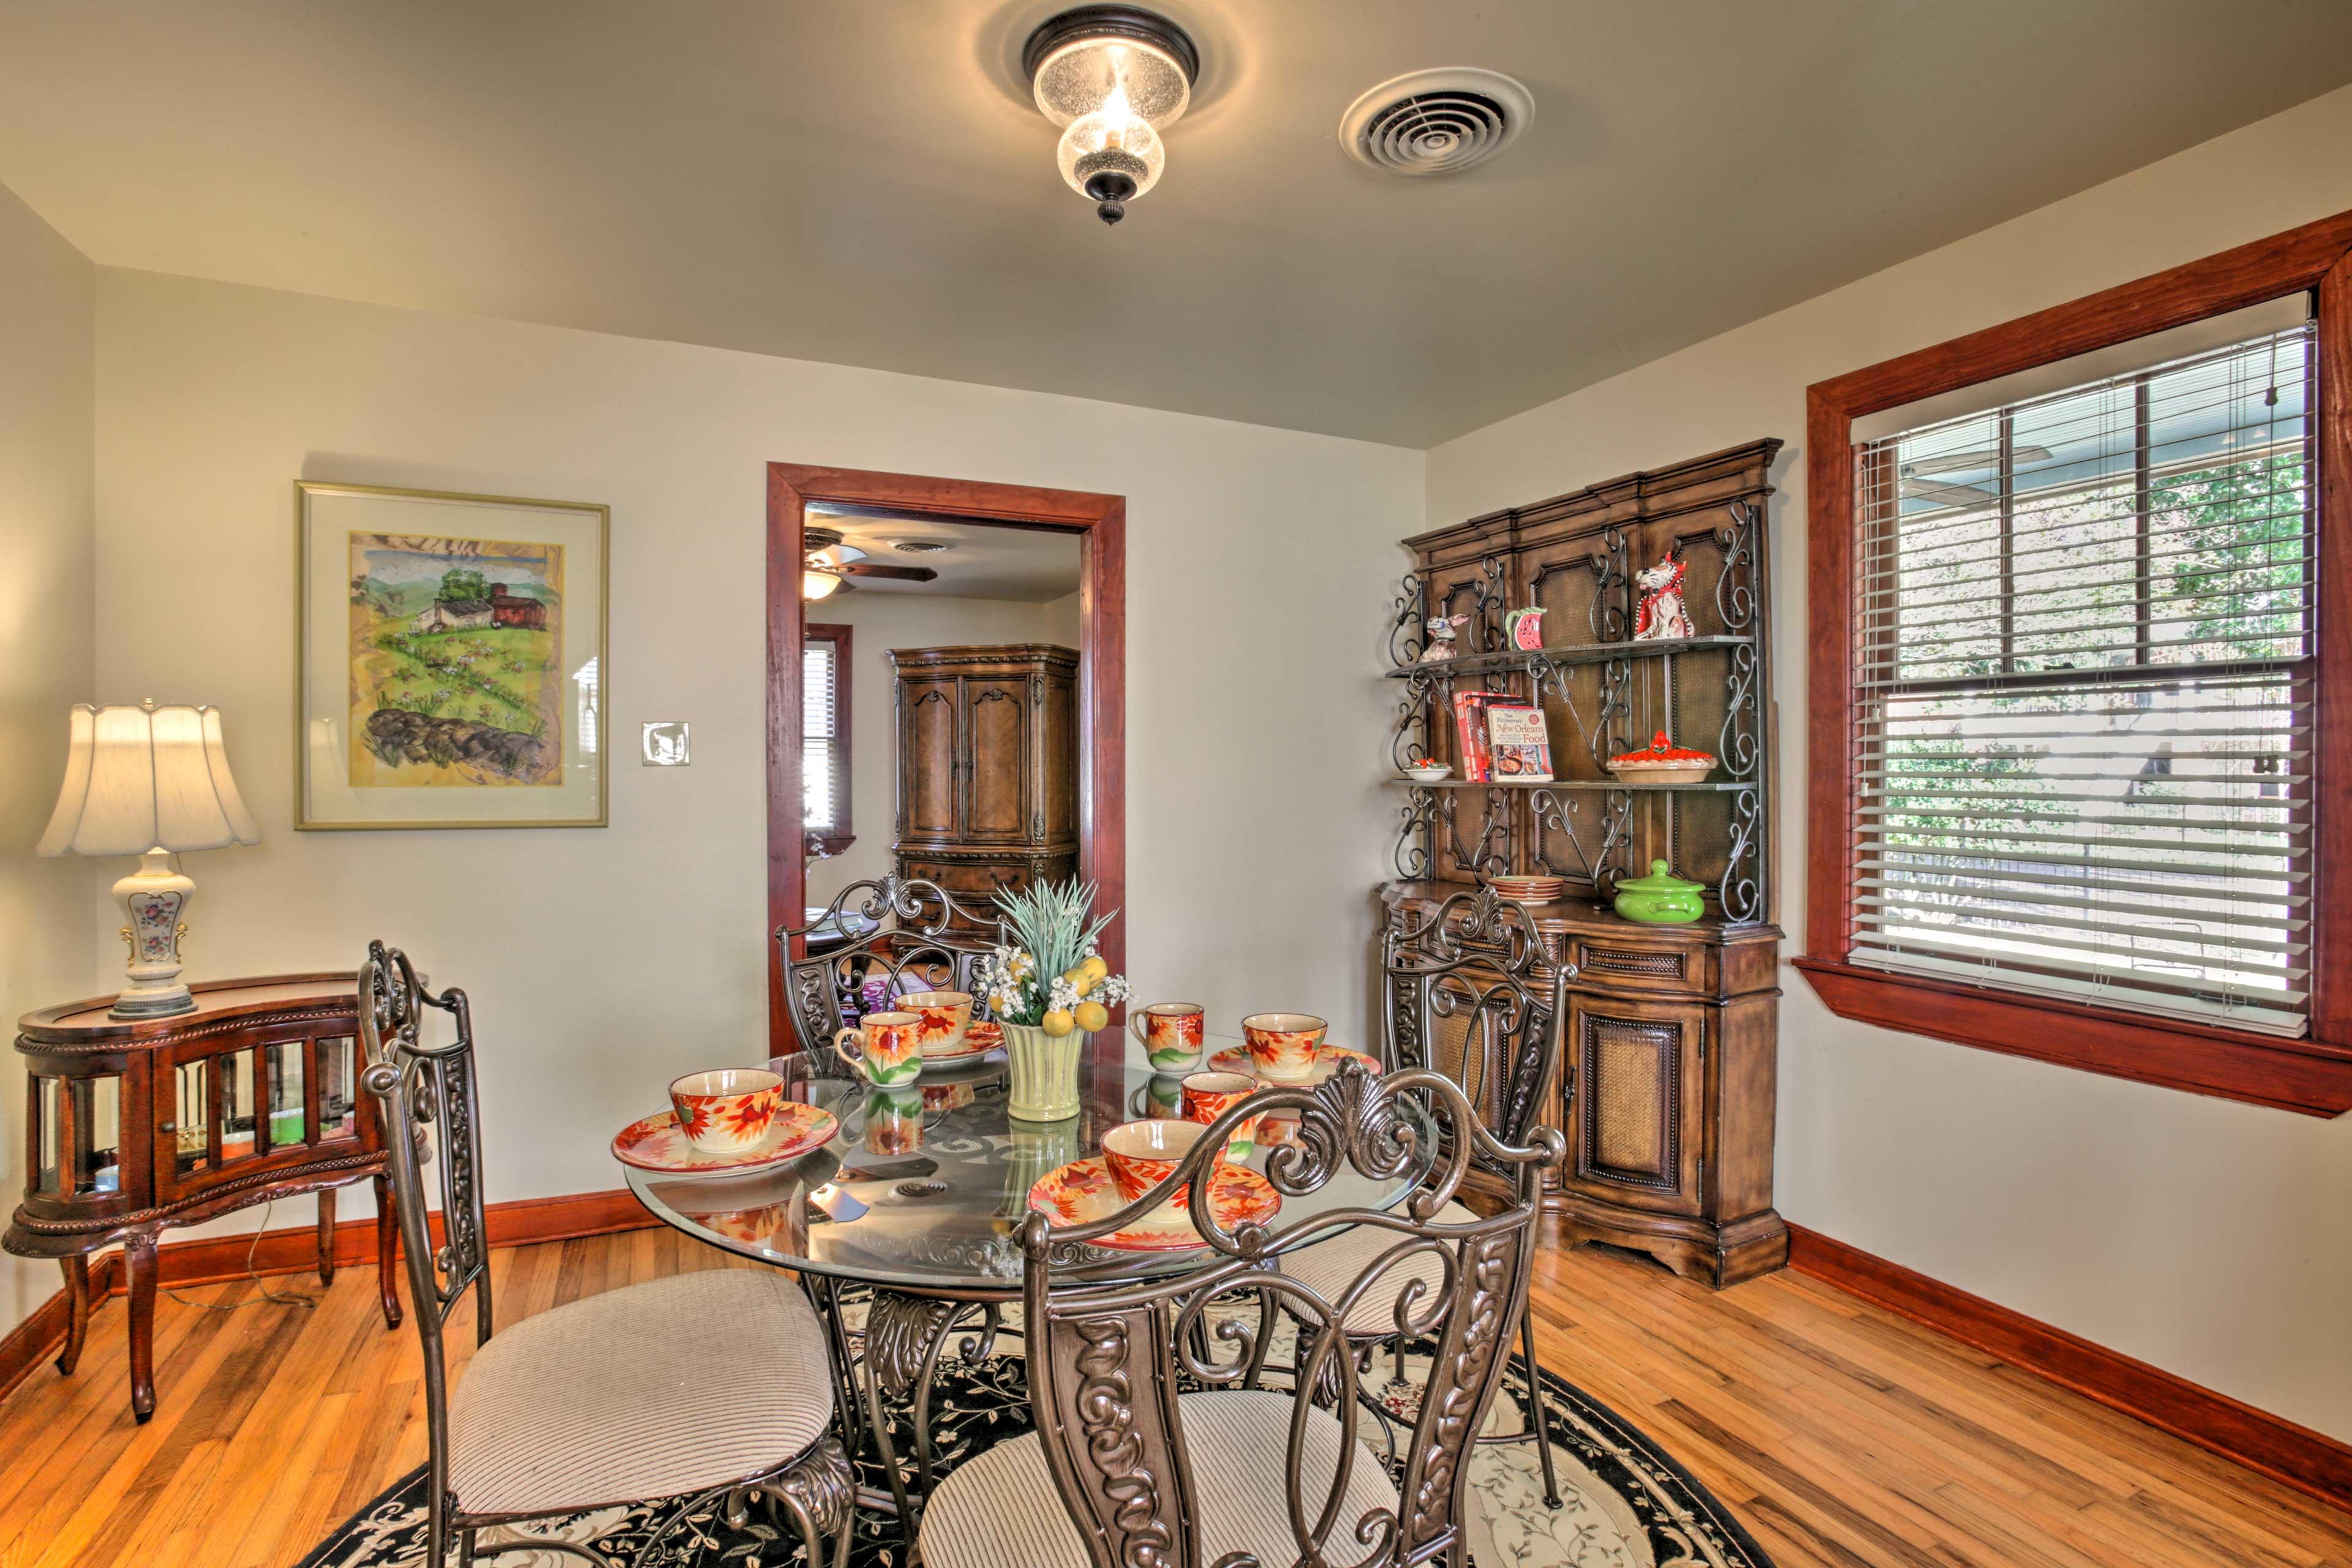 Serve dinner in the elegant dining space set for 4!